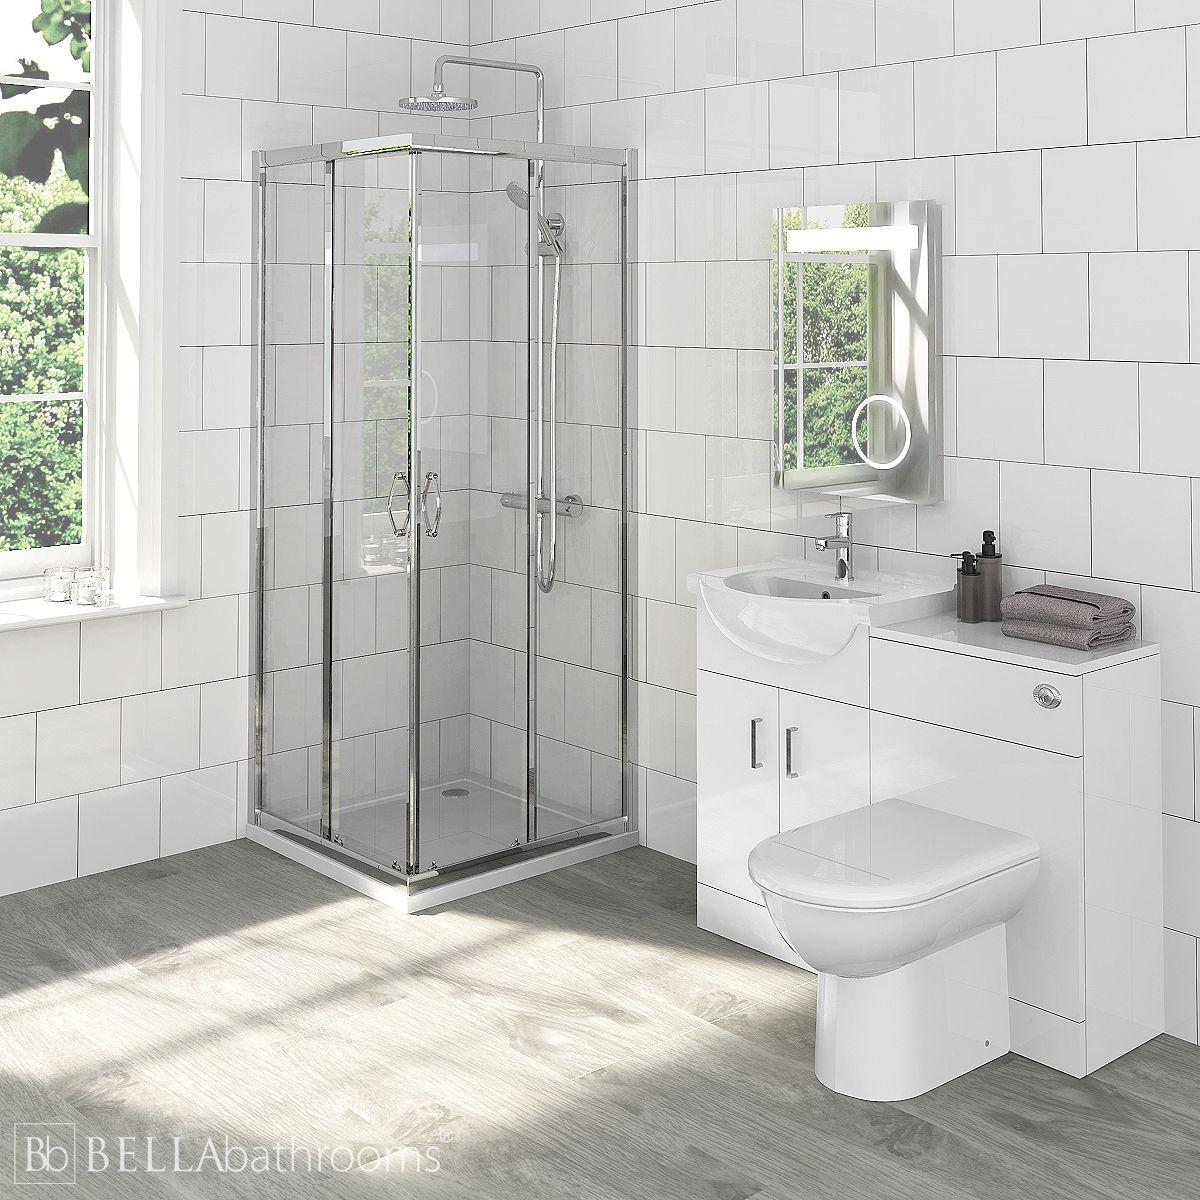 Saturn Bathroom Furniture Pack with Ella Corner Entry Shower Enclosure